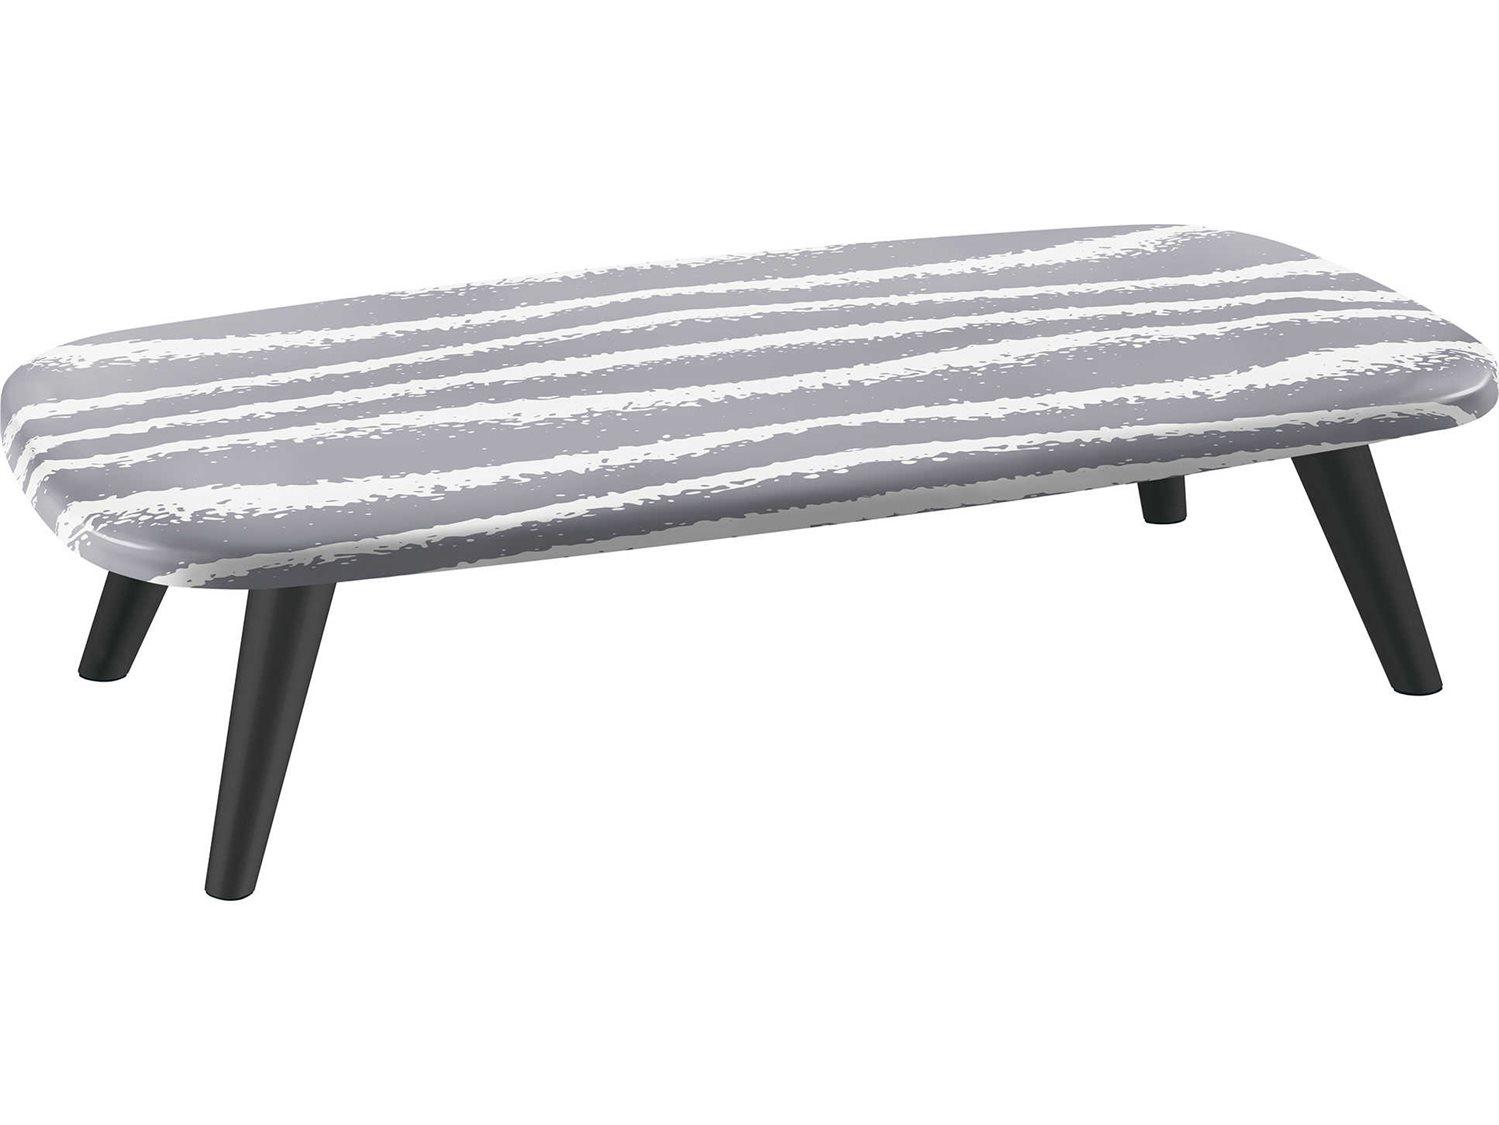 Sifas Riviera Grey White 59 Wide Aluminum Rectangular Coffee Table Sfarira26